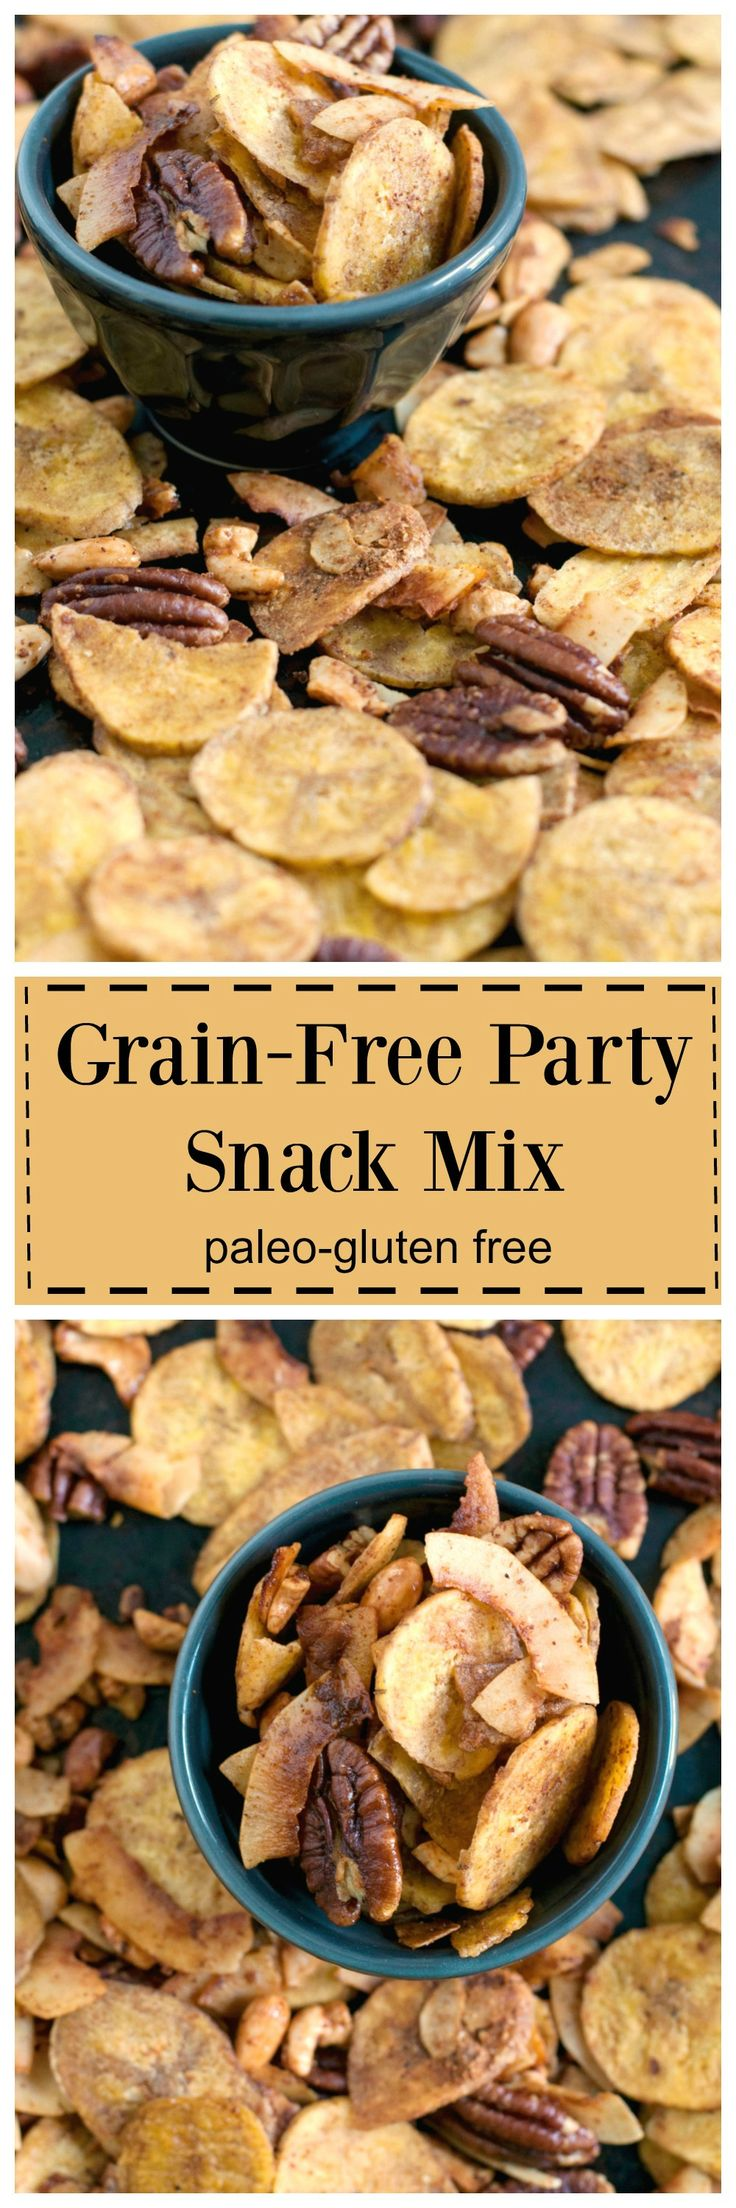 grain-free-snack-party-mix-a-grain-free-take-on-chex-mix-paleo-glutenfree